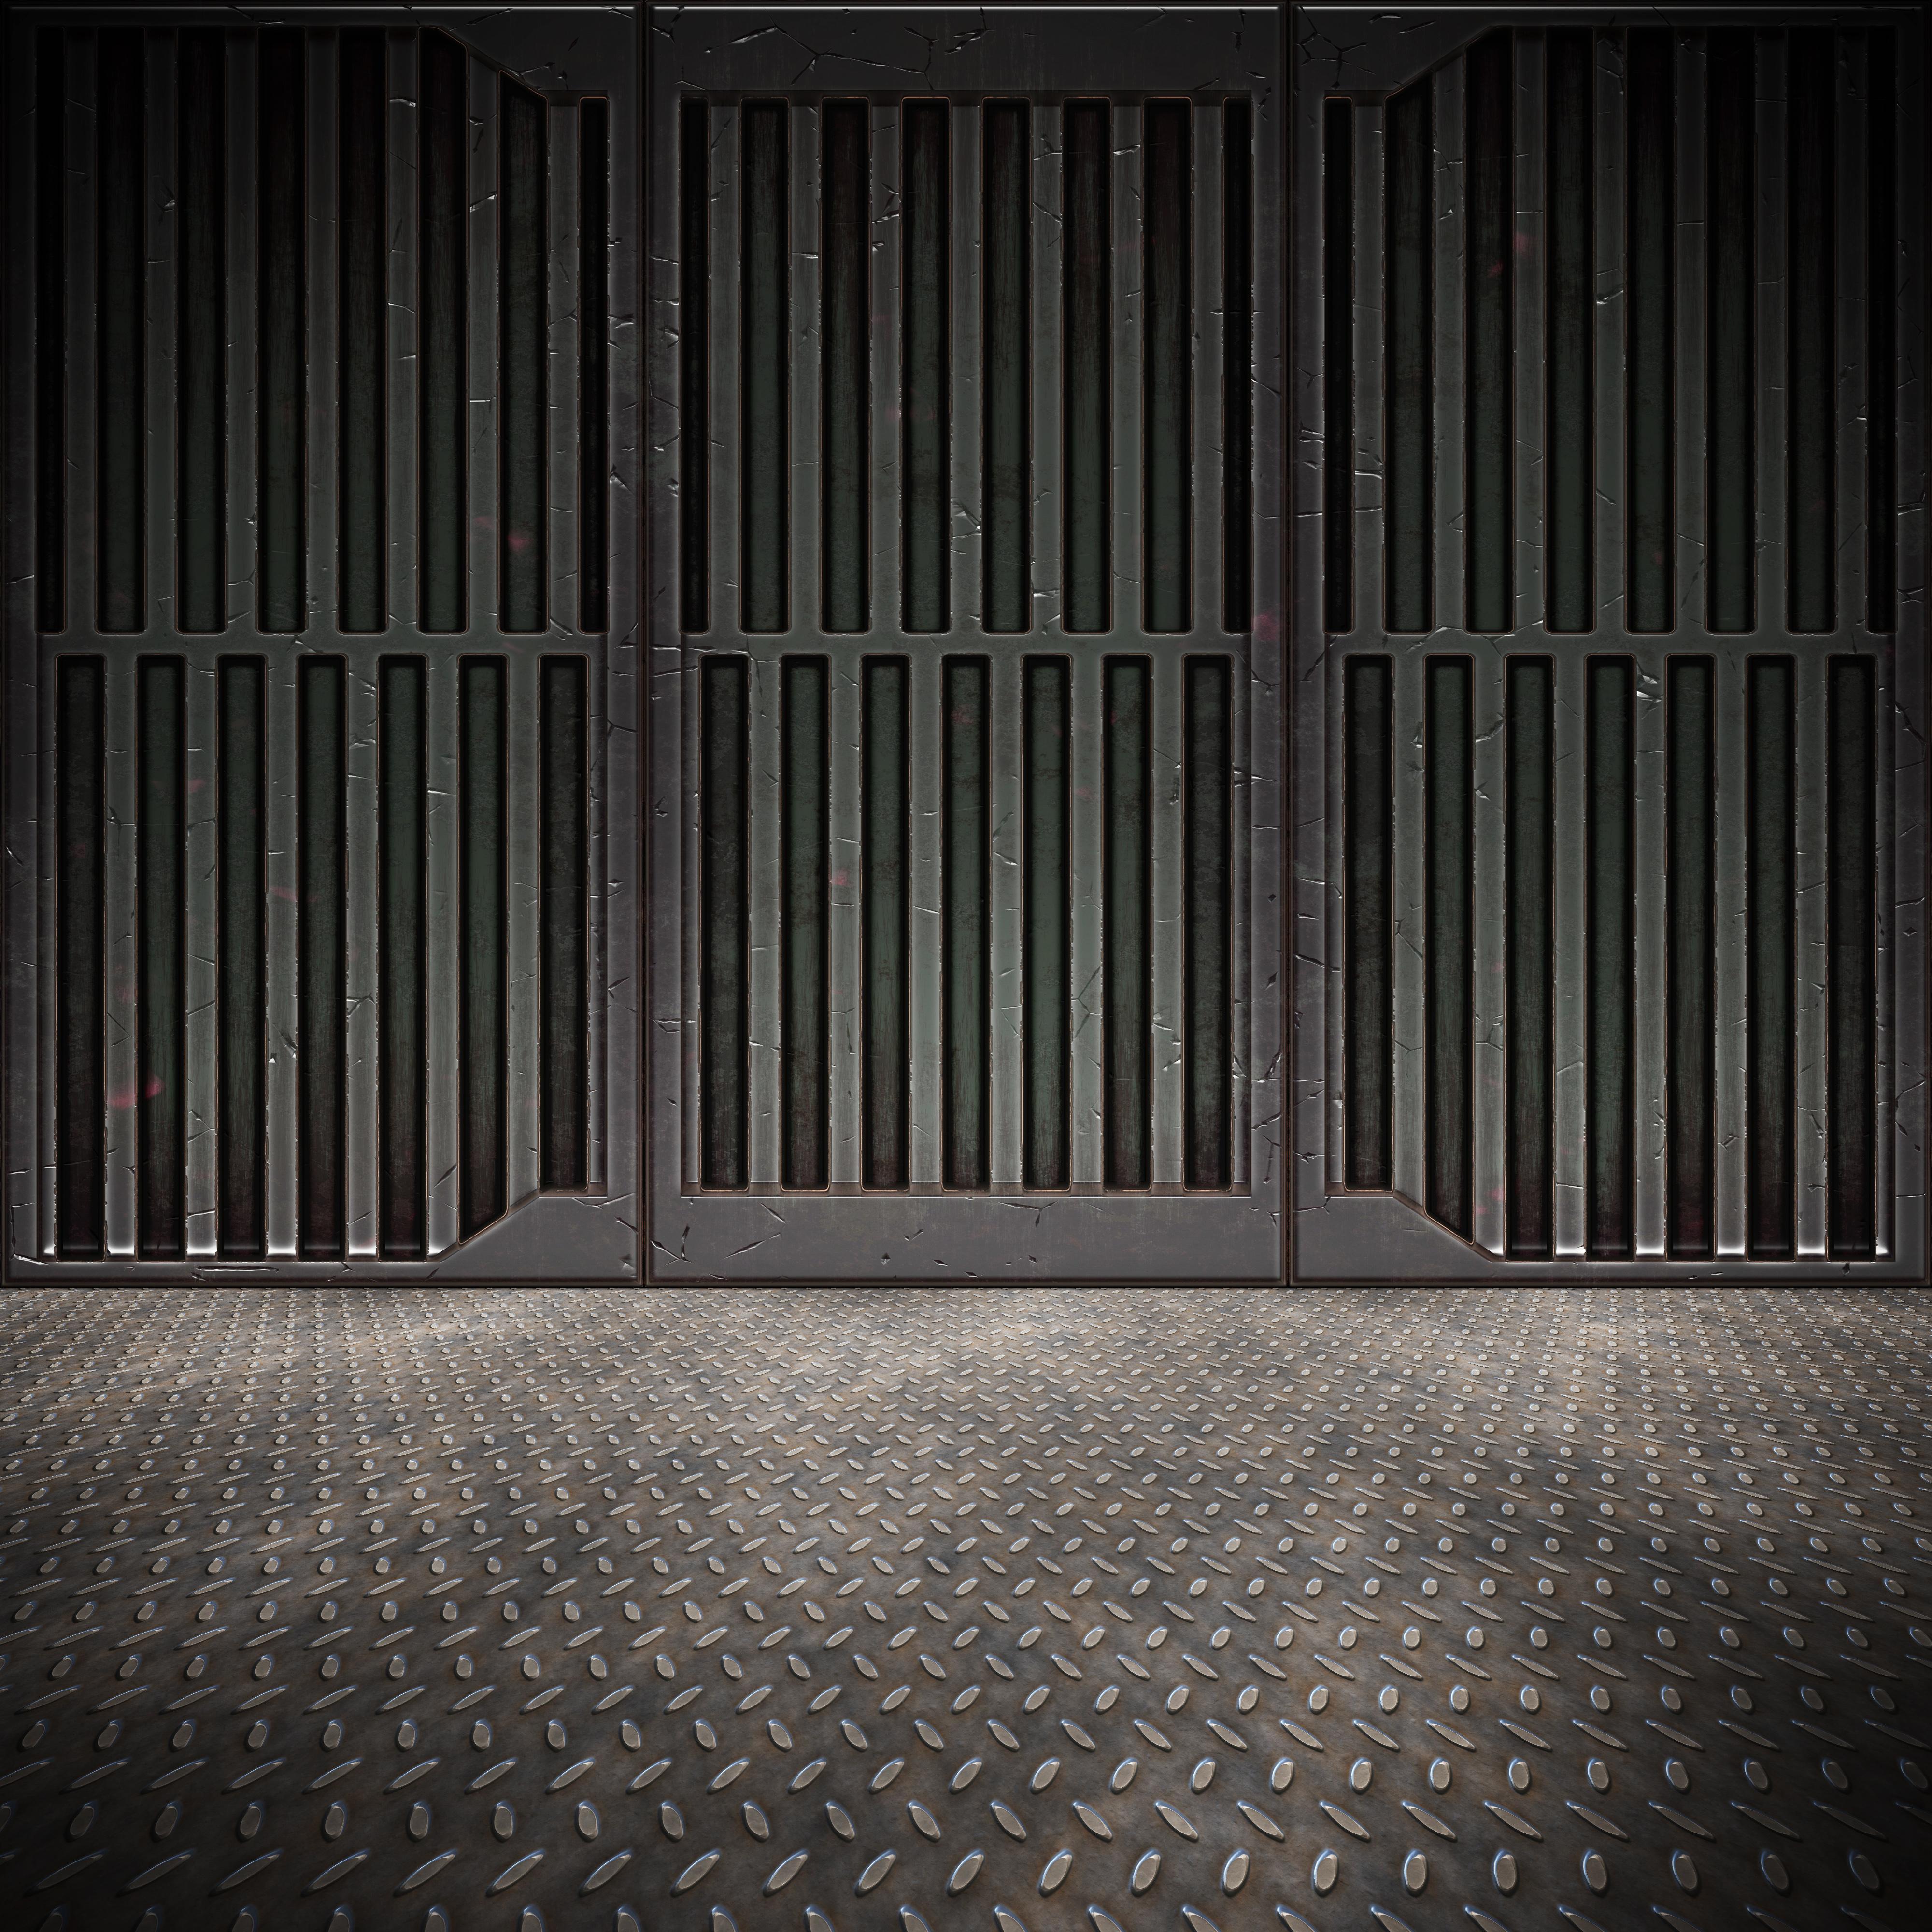 Steel Floor Background 5 by bouzid27 4000x4000